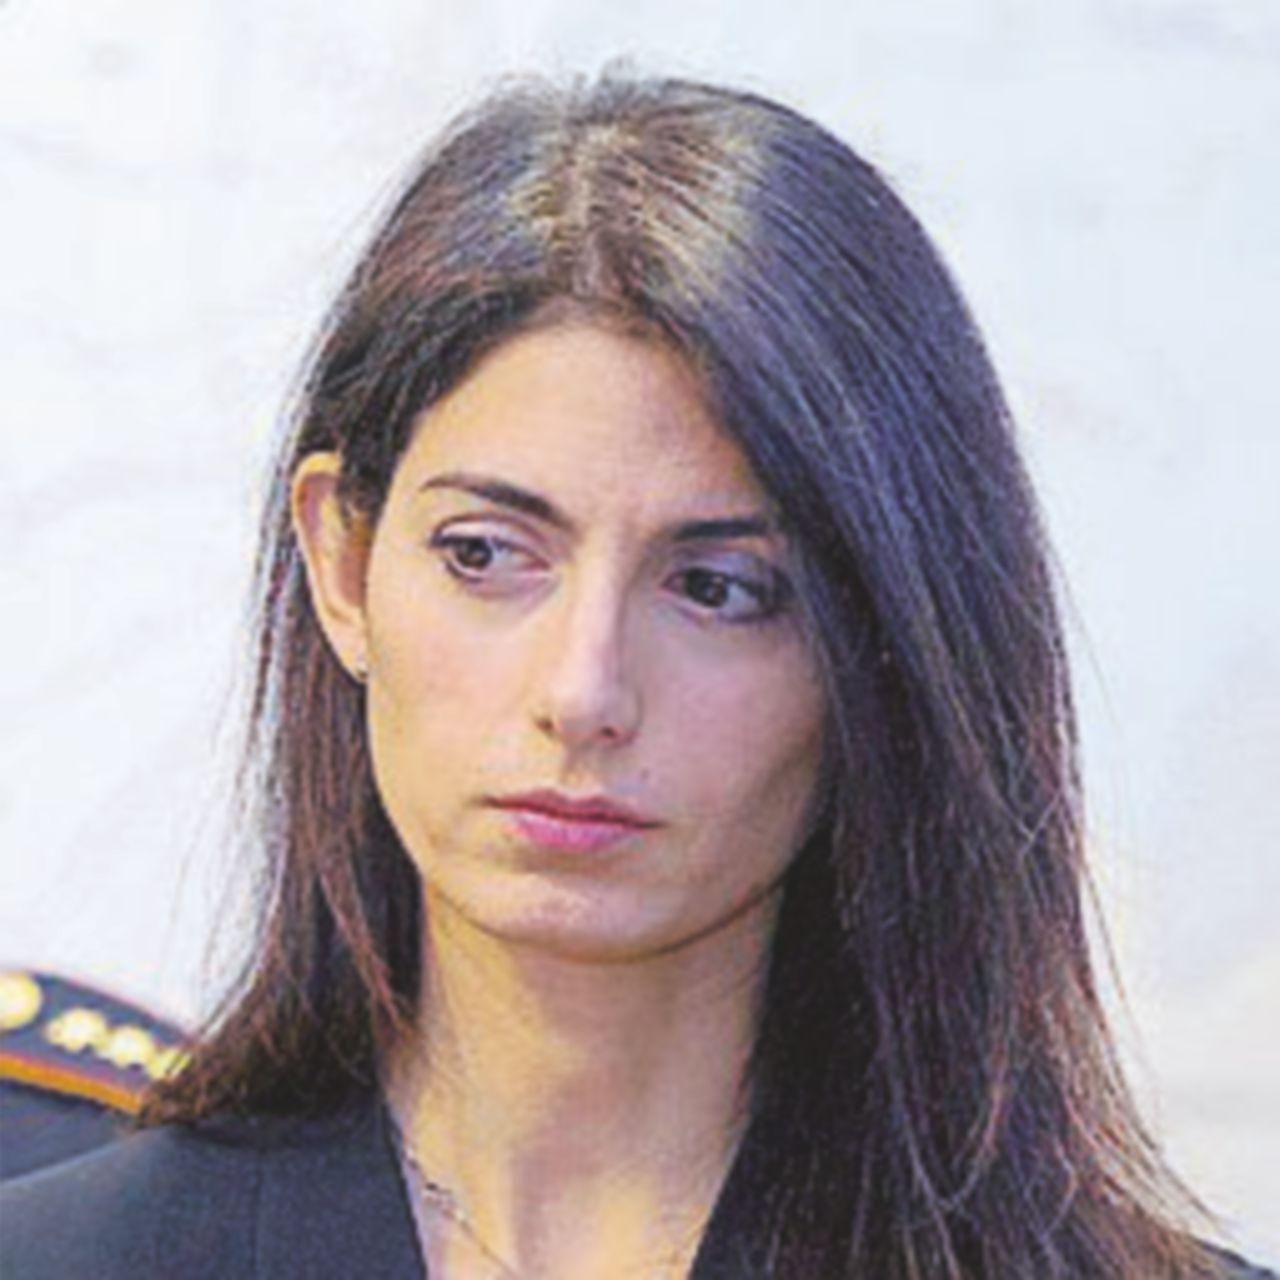 Imputato uno dei tre revisori Oref: bancarotta